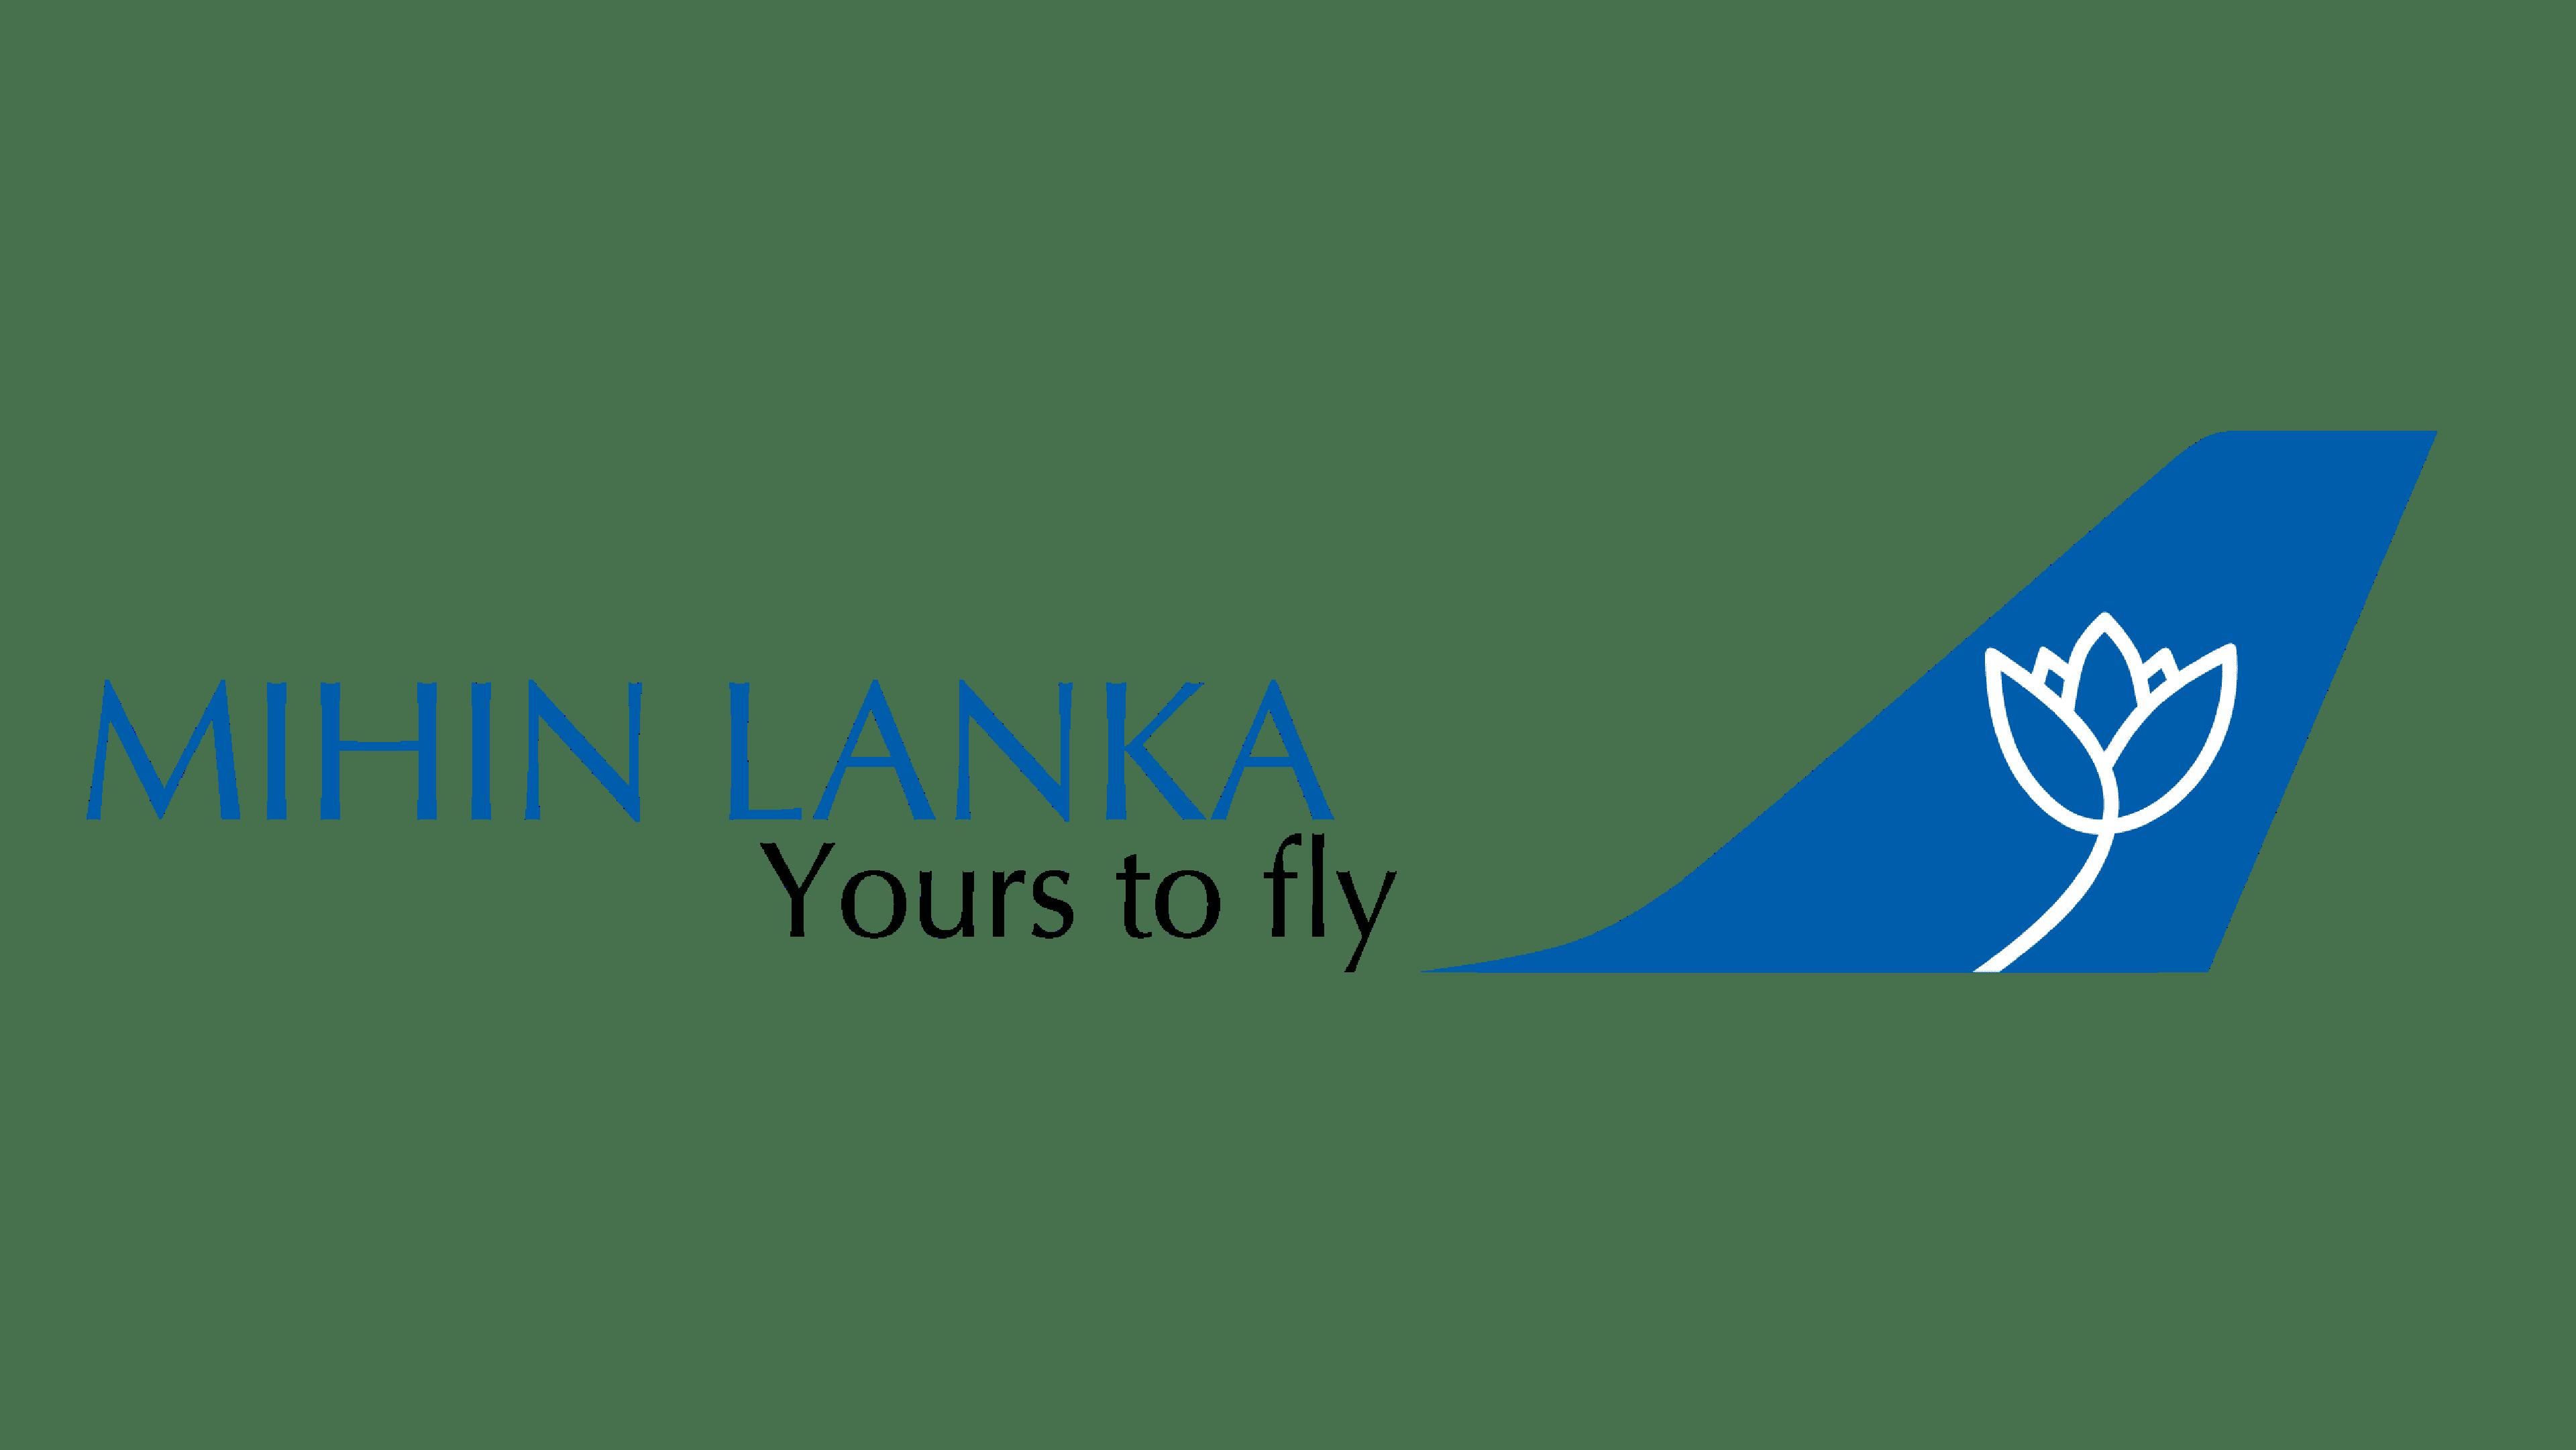 Mihin Lanka Logo Logo